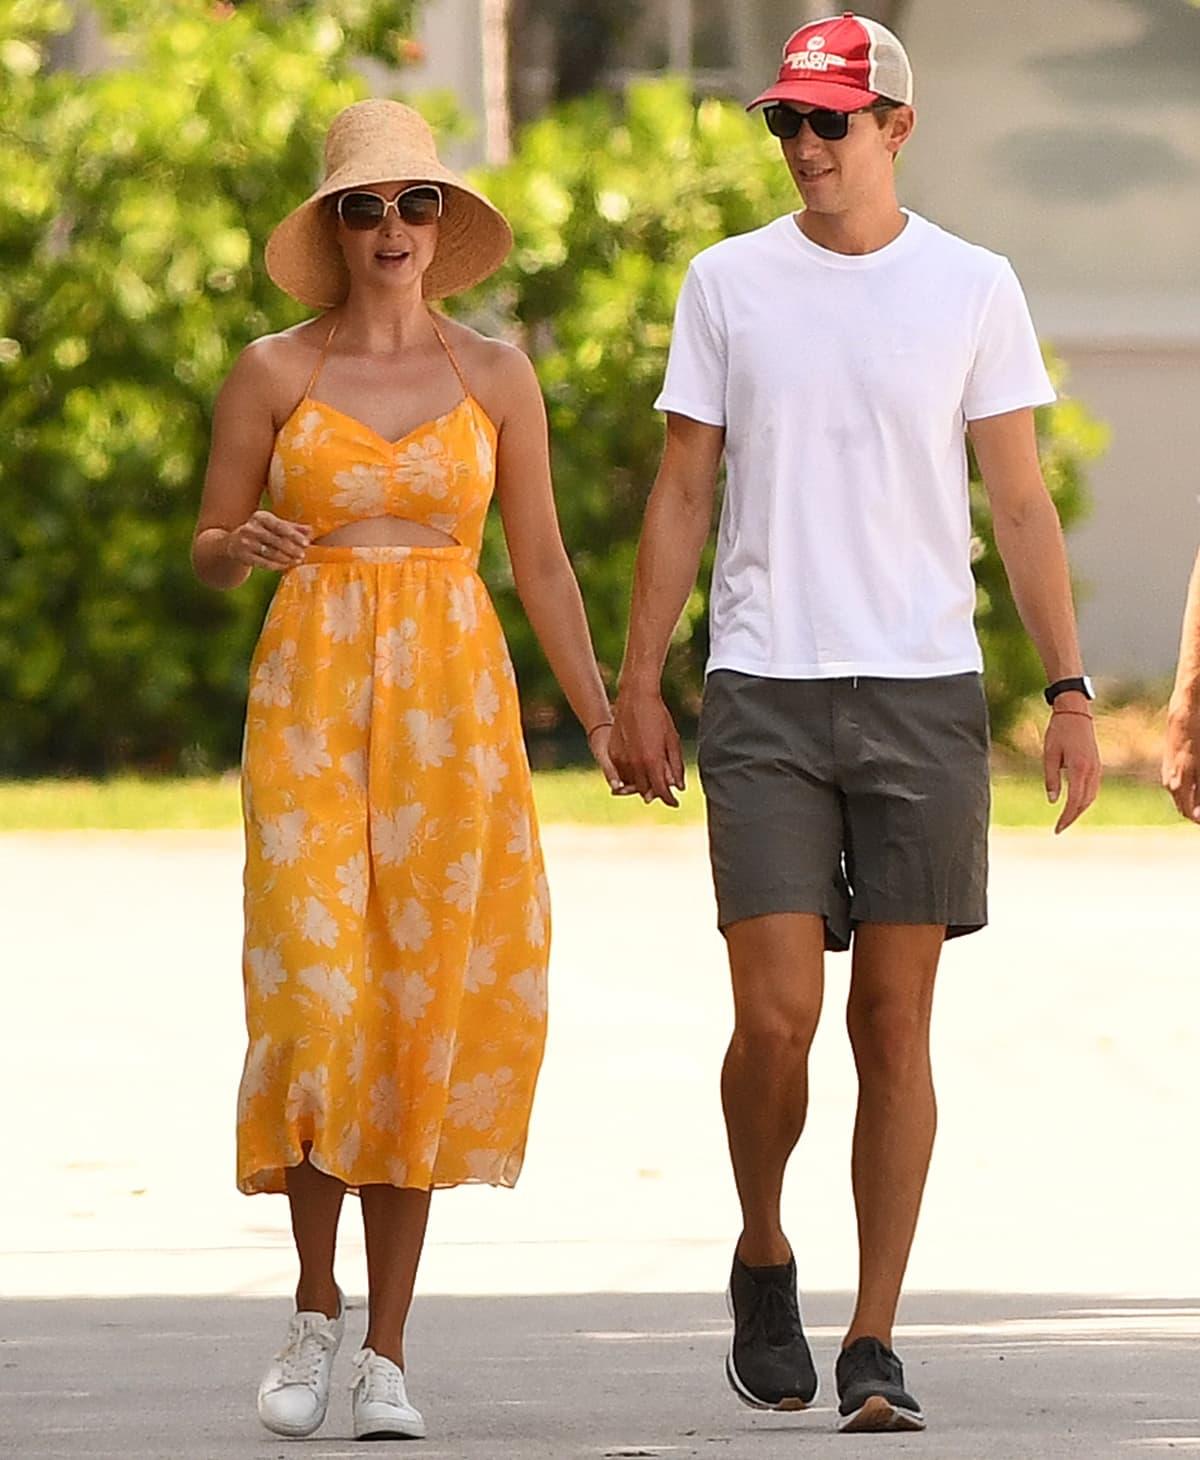 Ivanka Trump wears a yellow cutout sundress as she takes a walk with her husband Jared Kushner